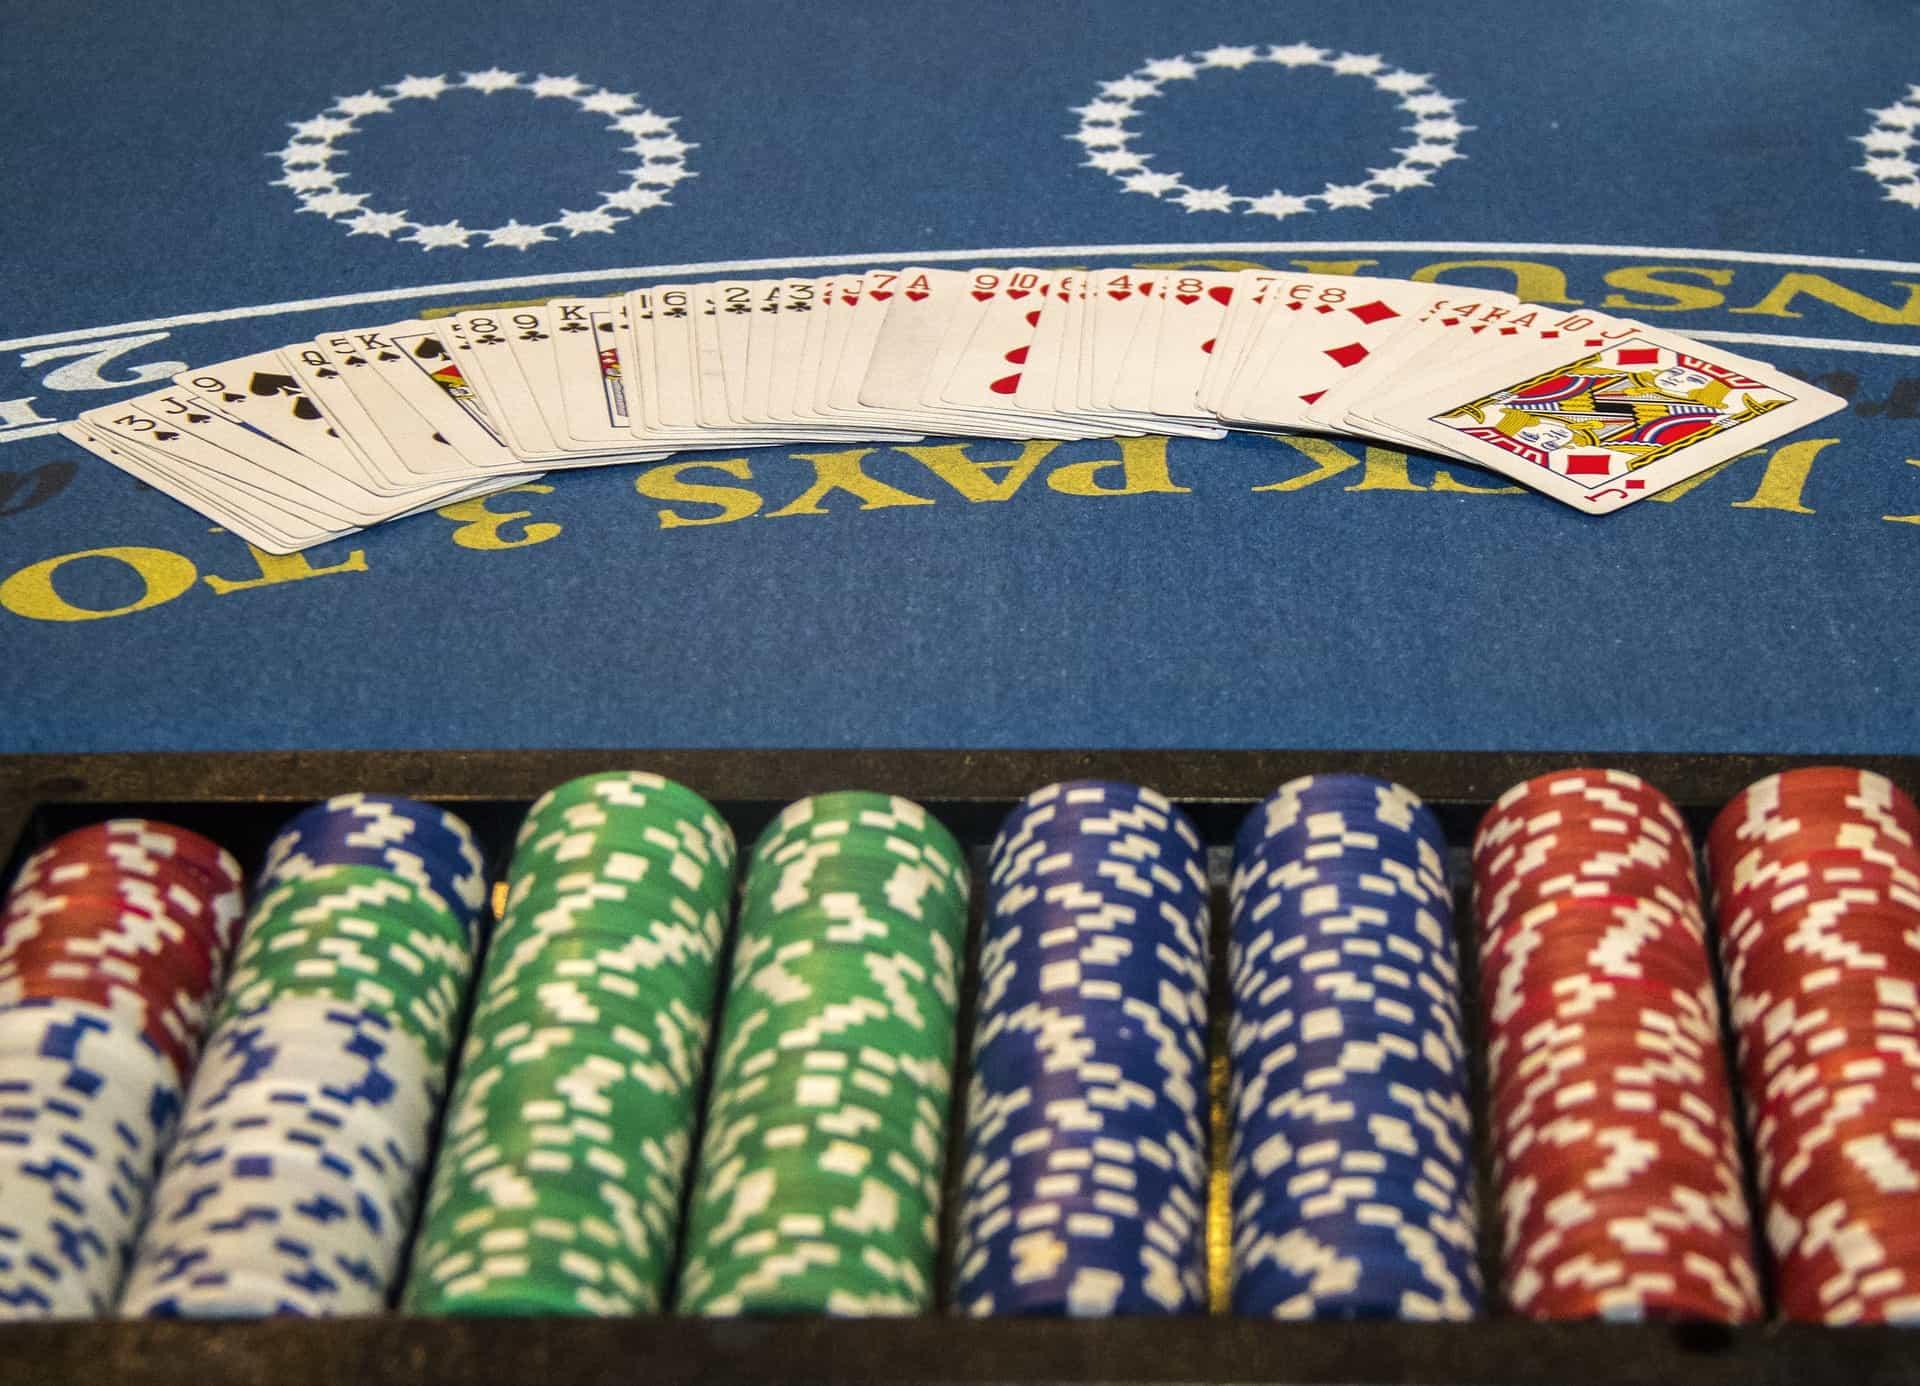 james bond casino royale baccarat